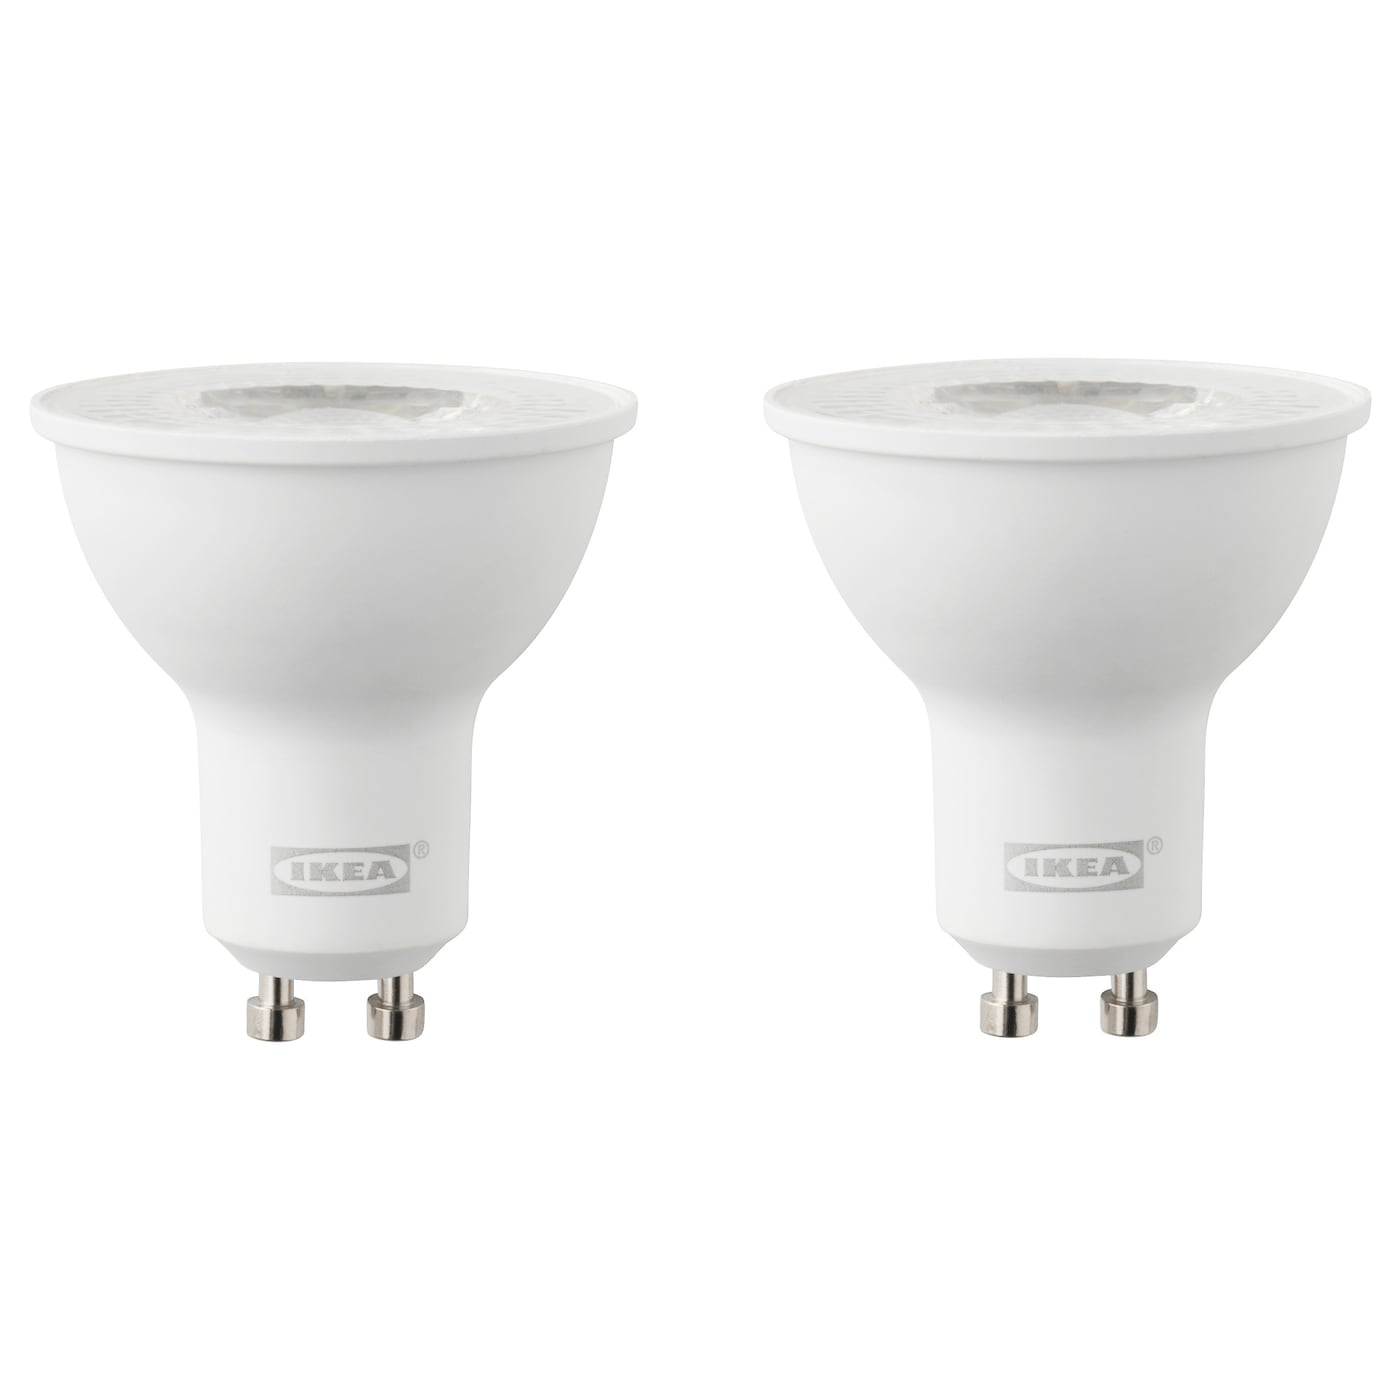 ryet led lamp gu10 400 lumen ikea. Black Bedroom Furniture Sets. Home Design Ideas